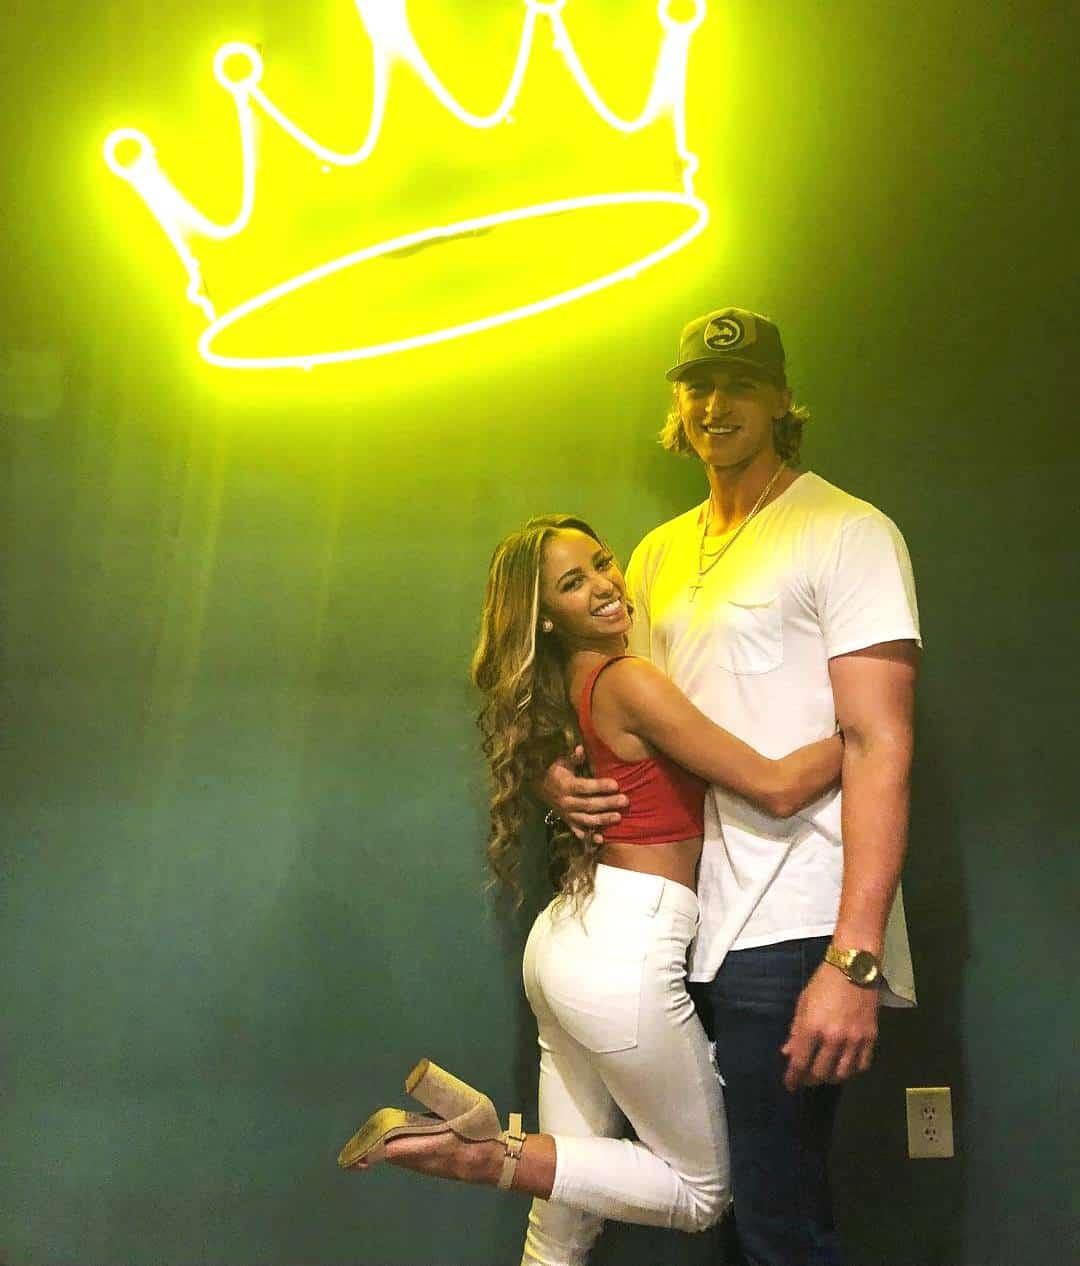 Michael Kopech girlfriend Vanessa Morgan